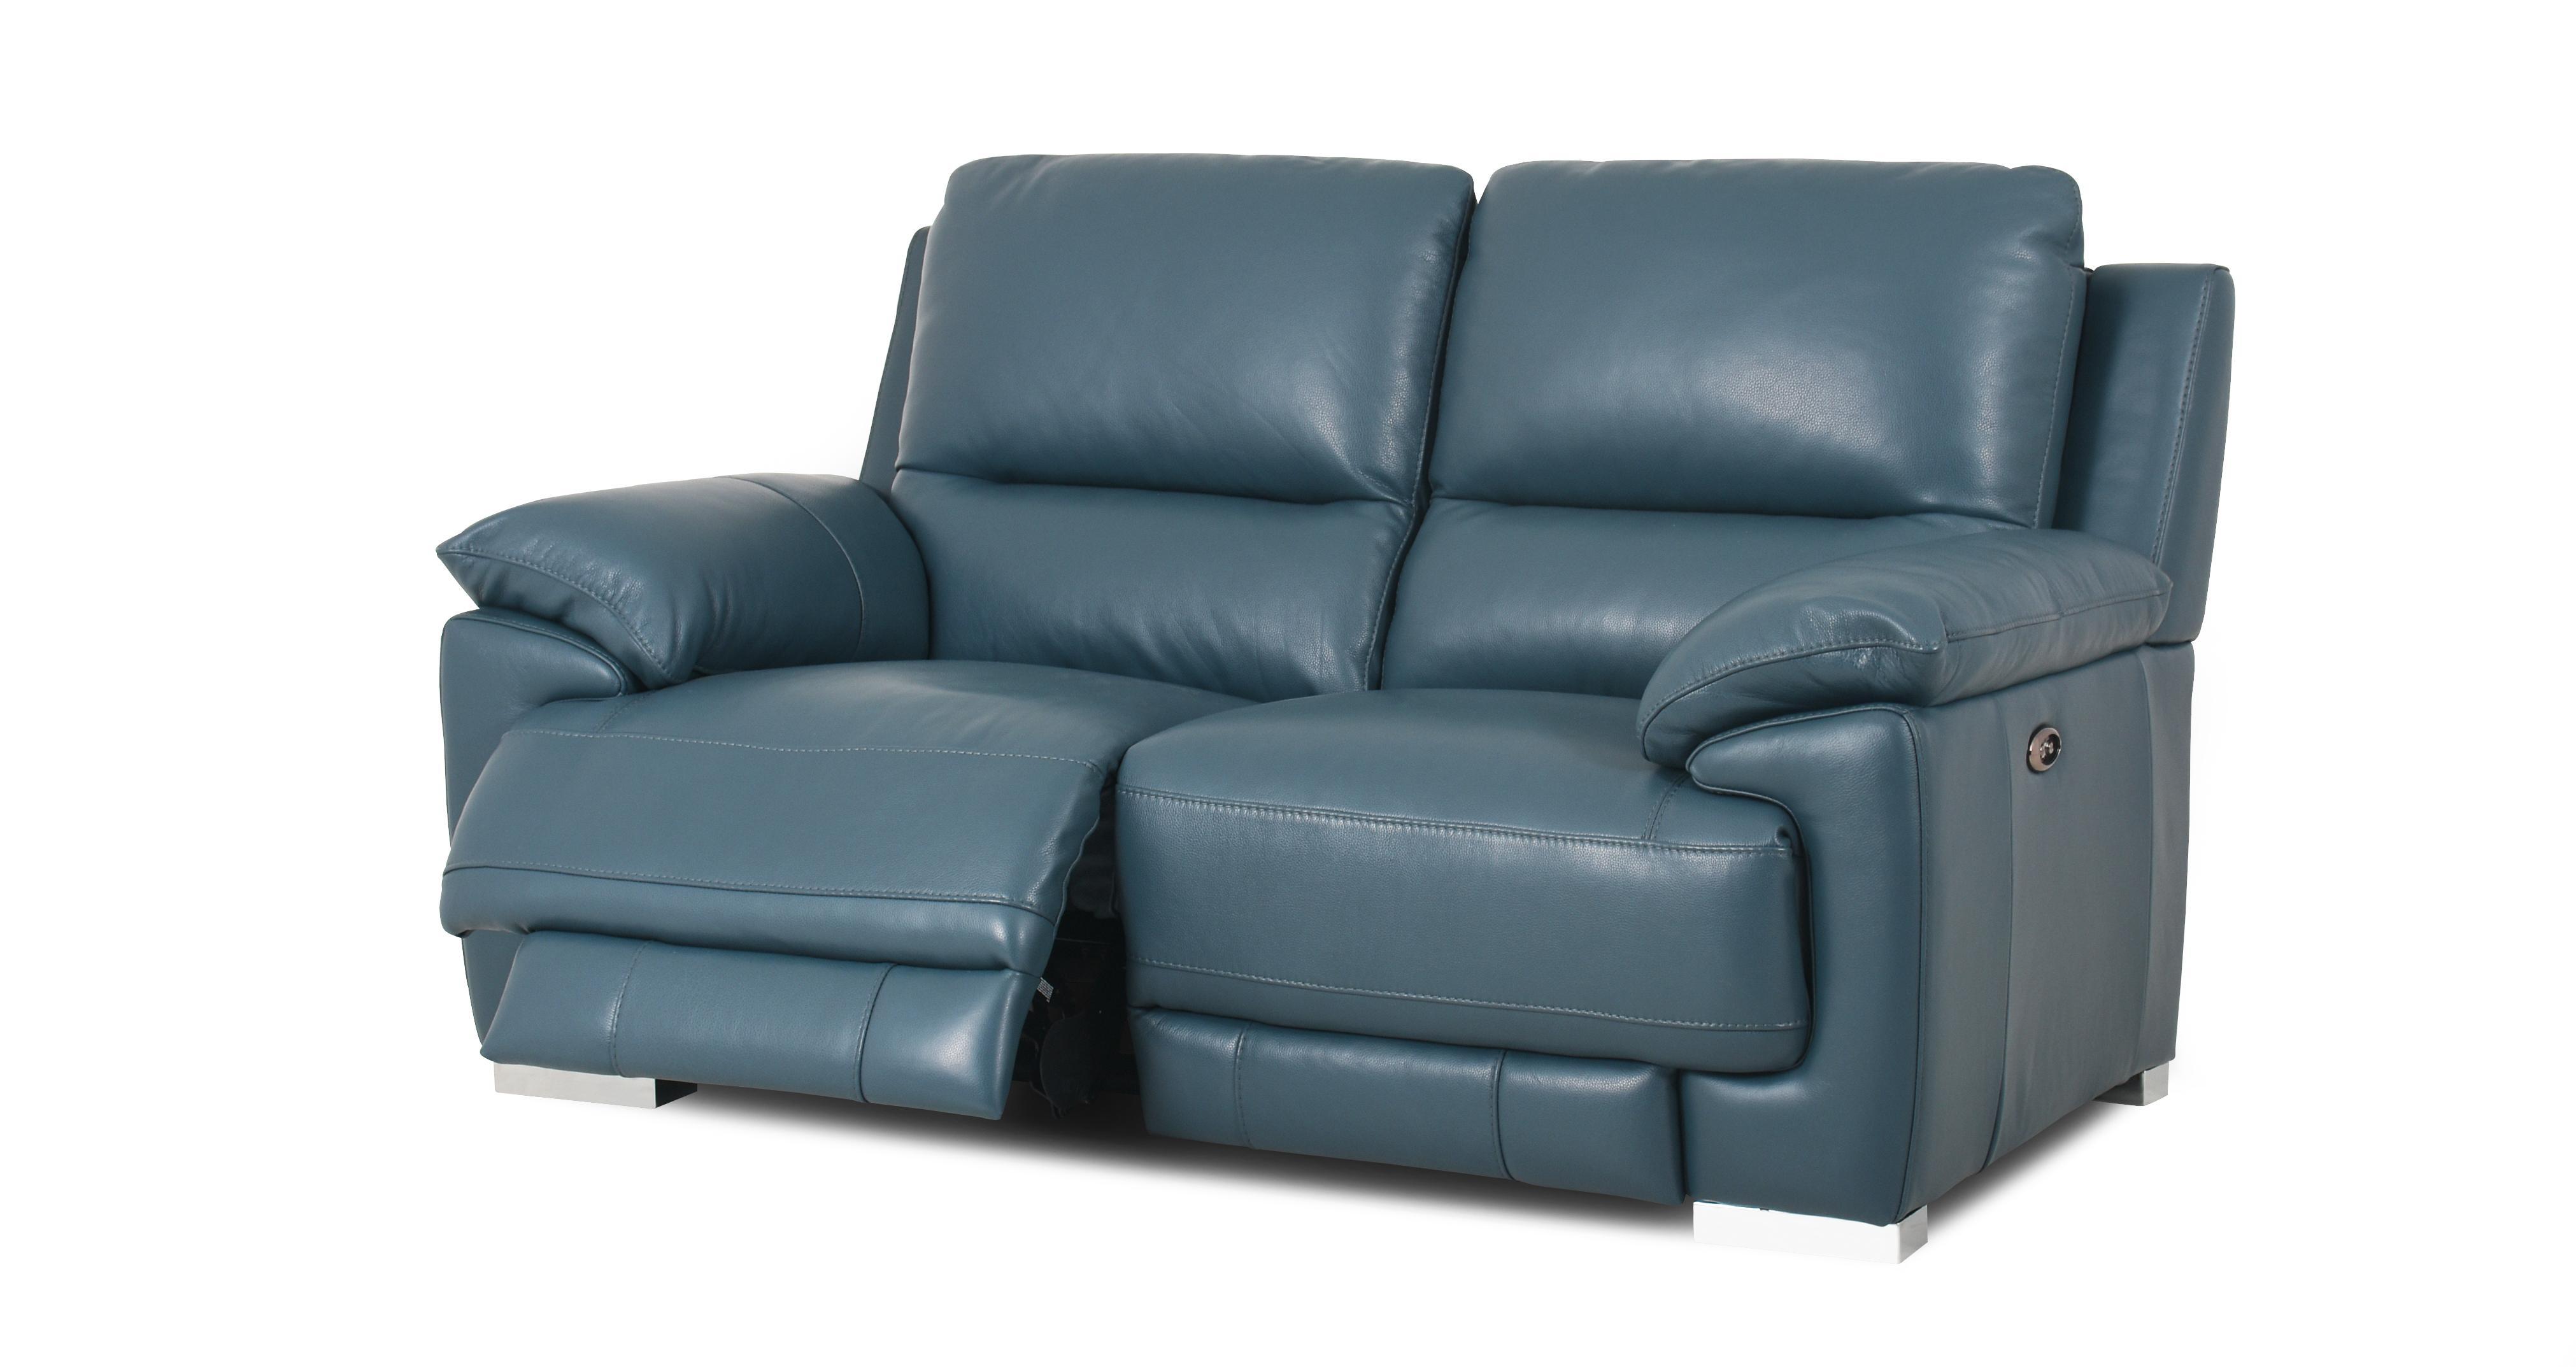 2 seater power recliner sofa big comfy corner sofas falcon new club dfs